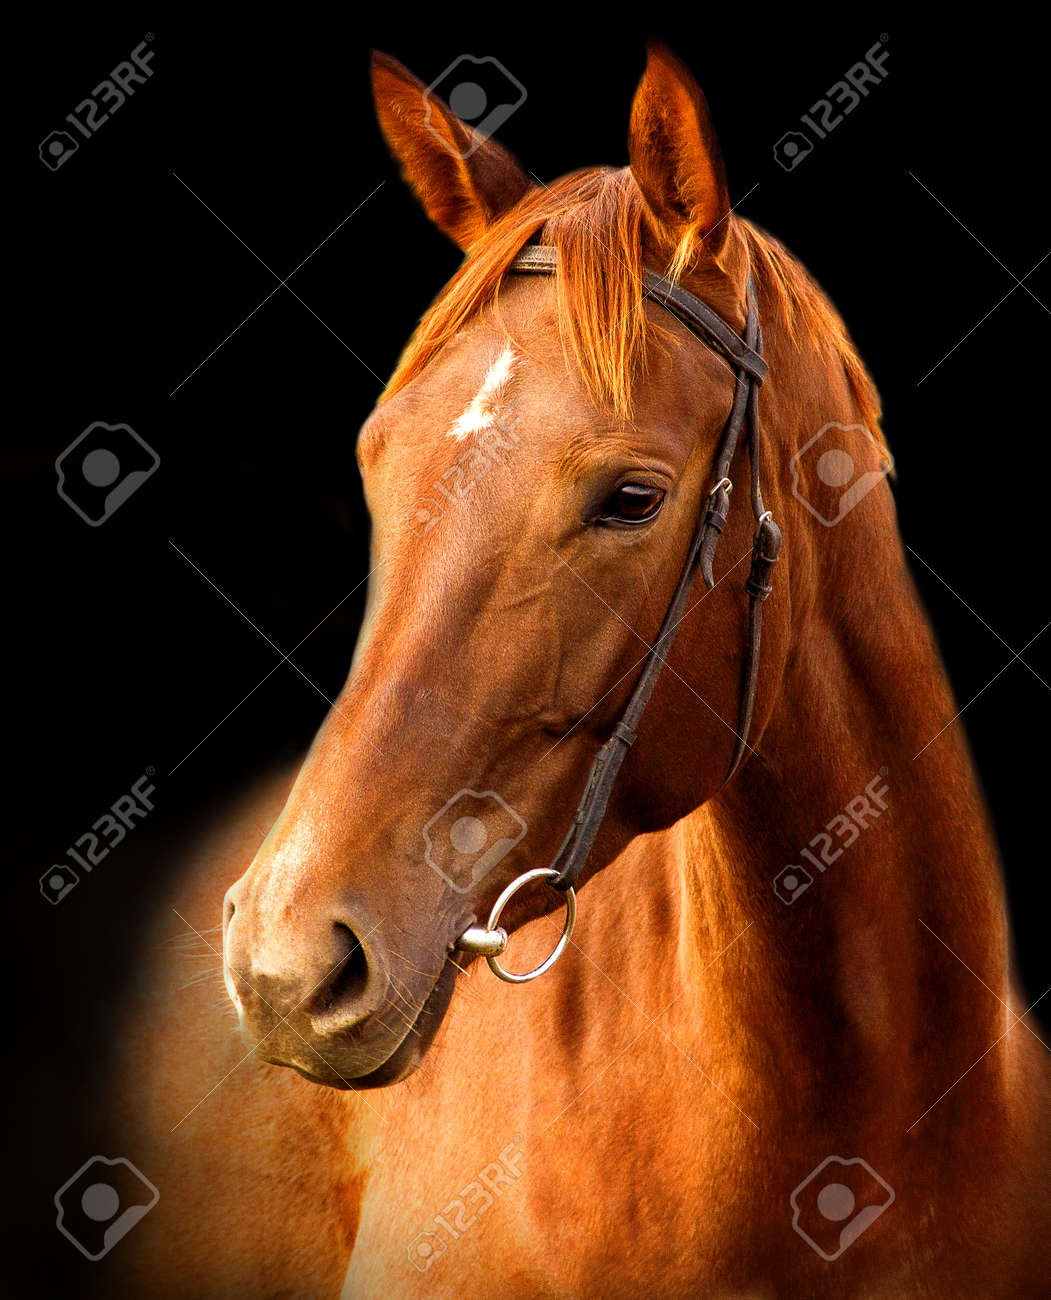 Portrait of red horse Trakehner on a black background - 158467589